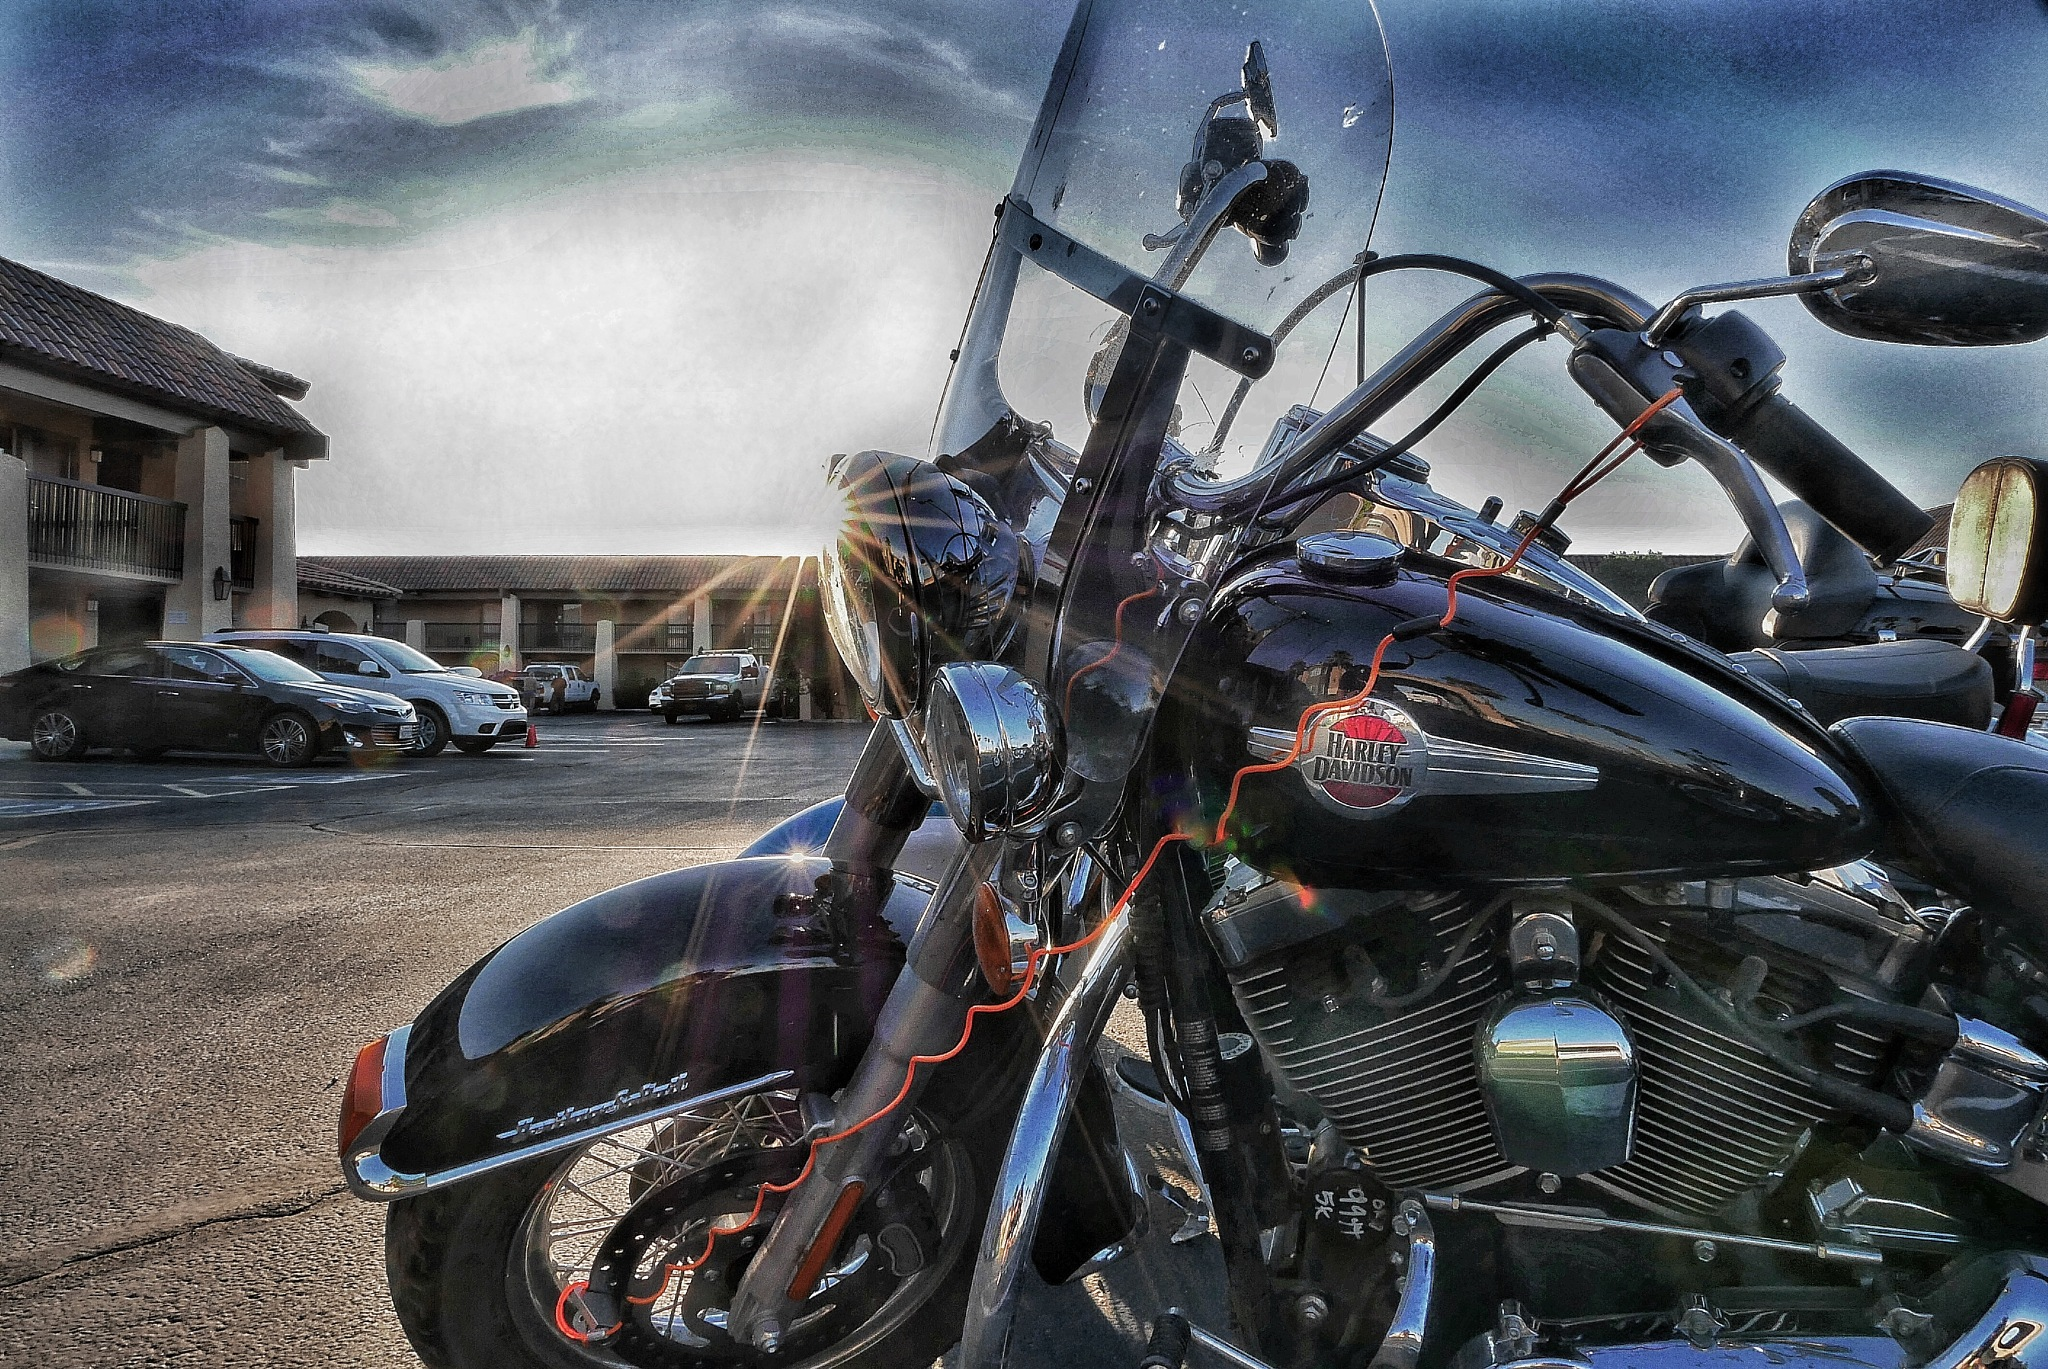 Early Morning Arizona- U.S.Route 66 by Walter Novak